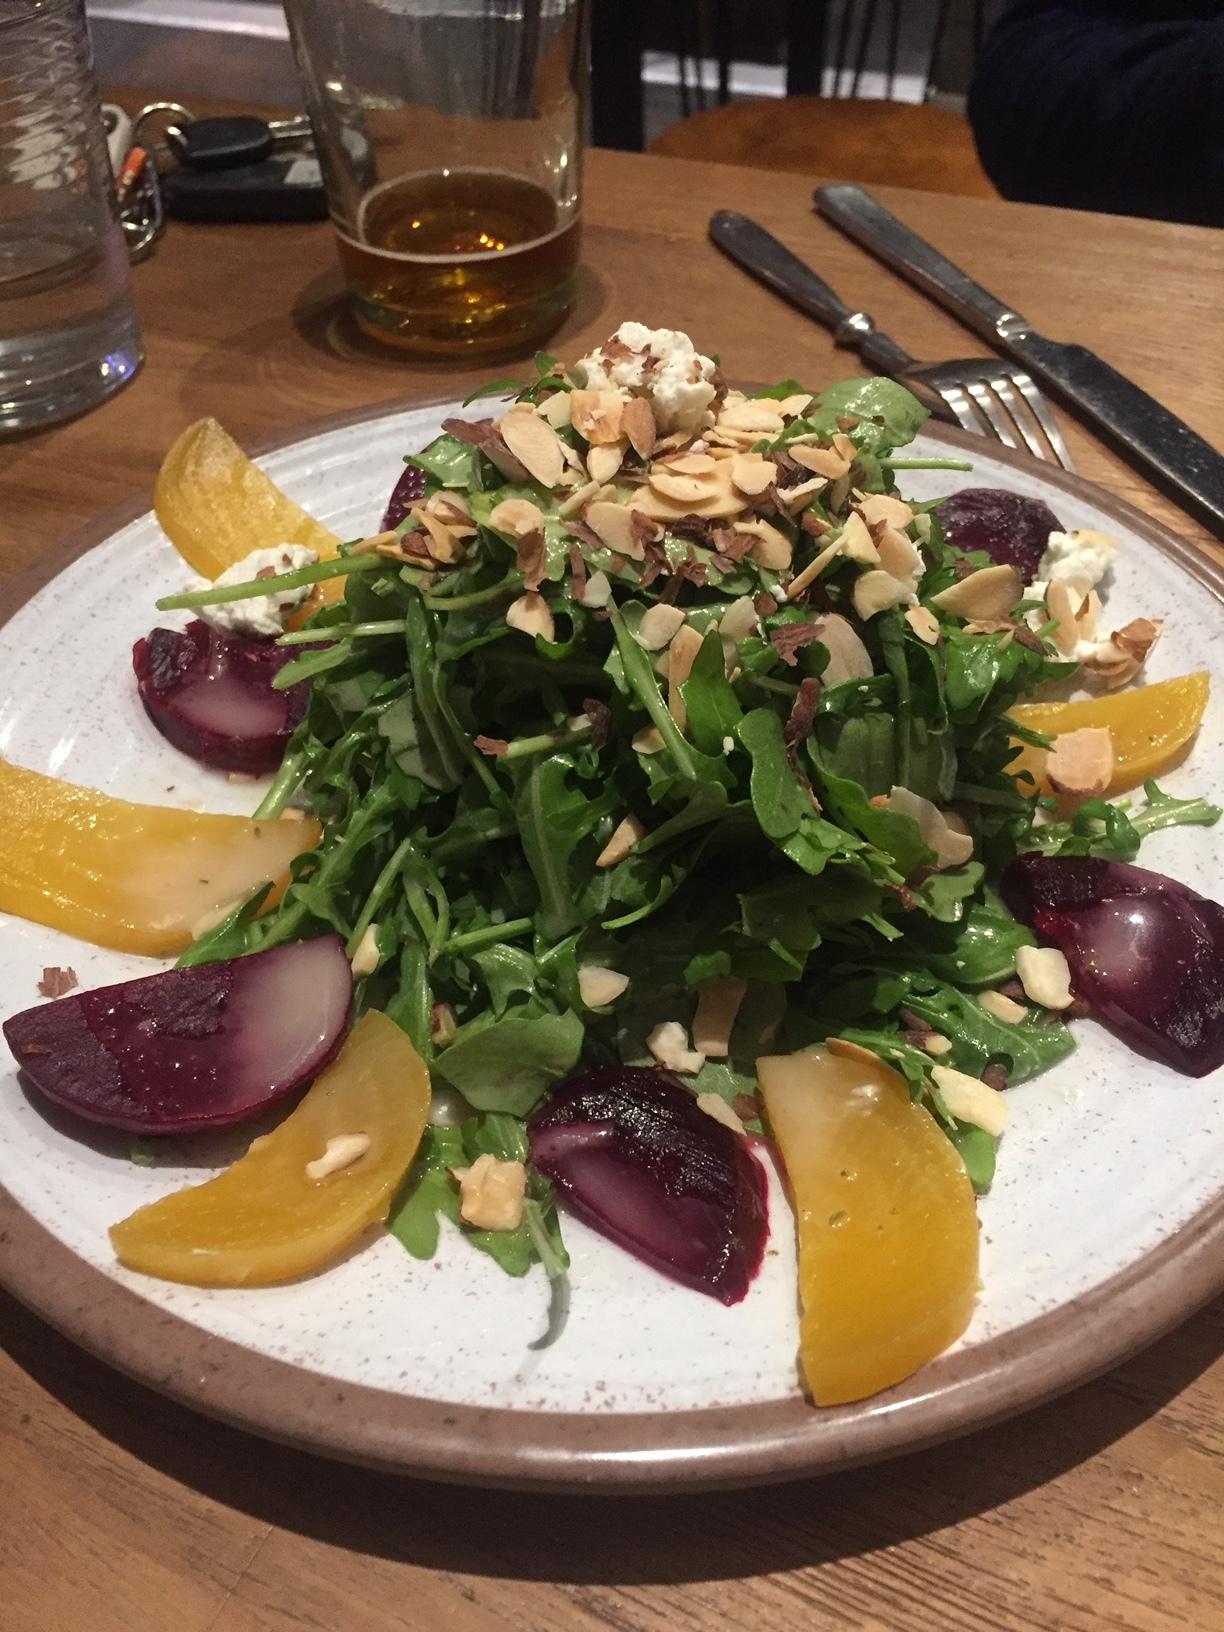 Roasted beet salad with a tart Lemon vinaigrette